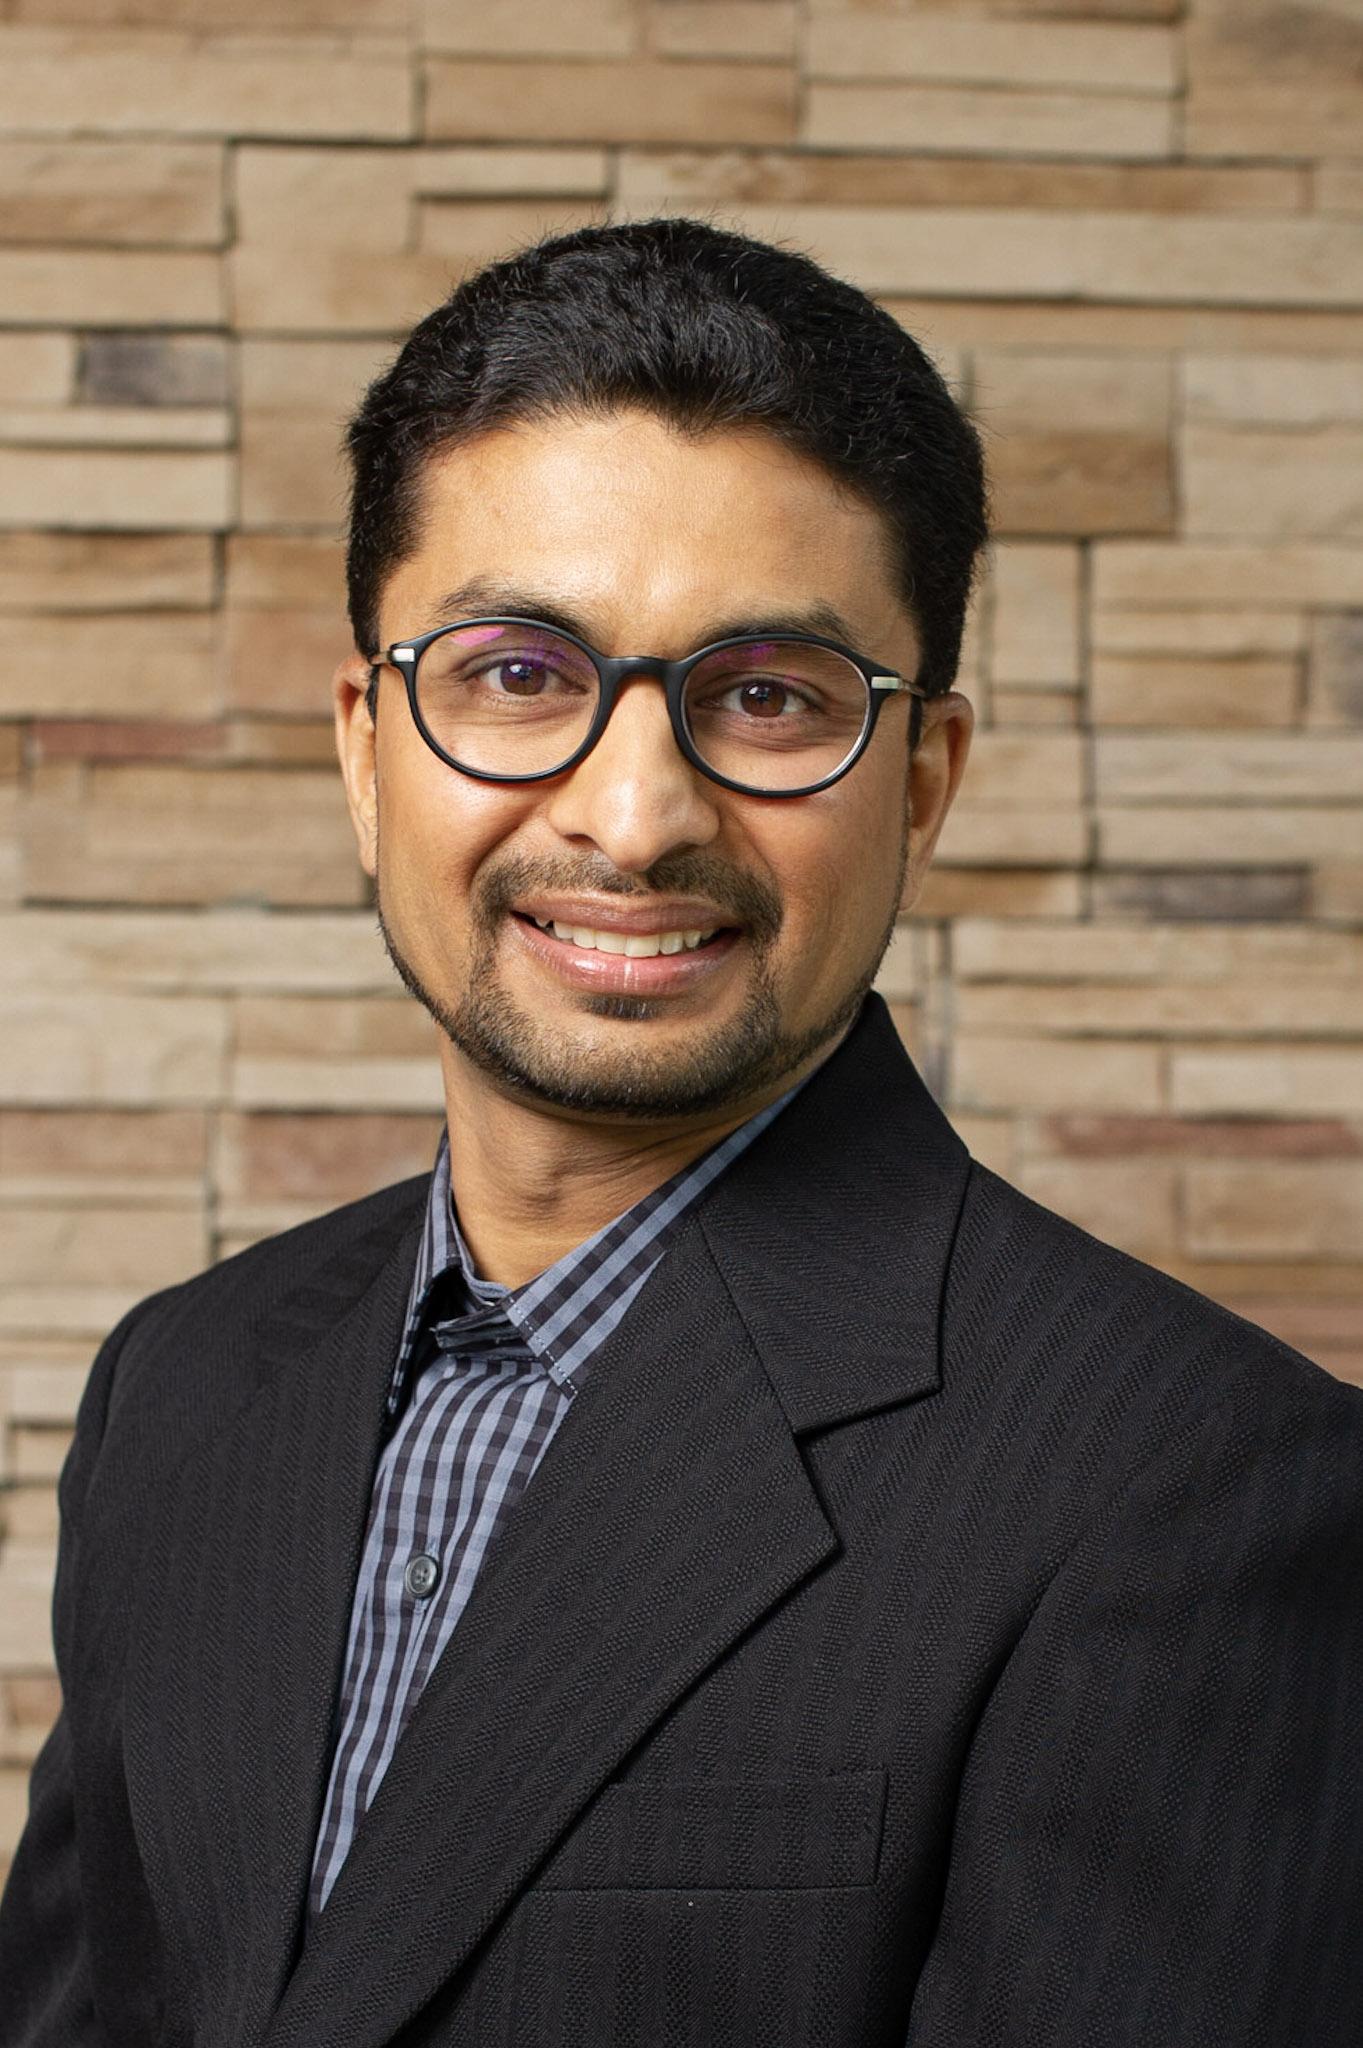 Rupam Chokshi, Director of Product Marketing